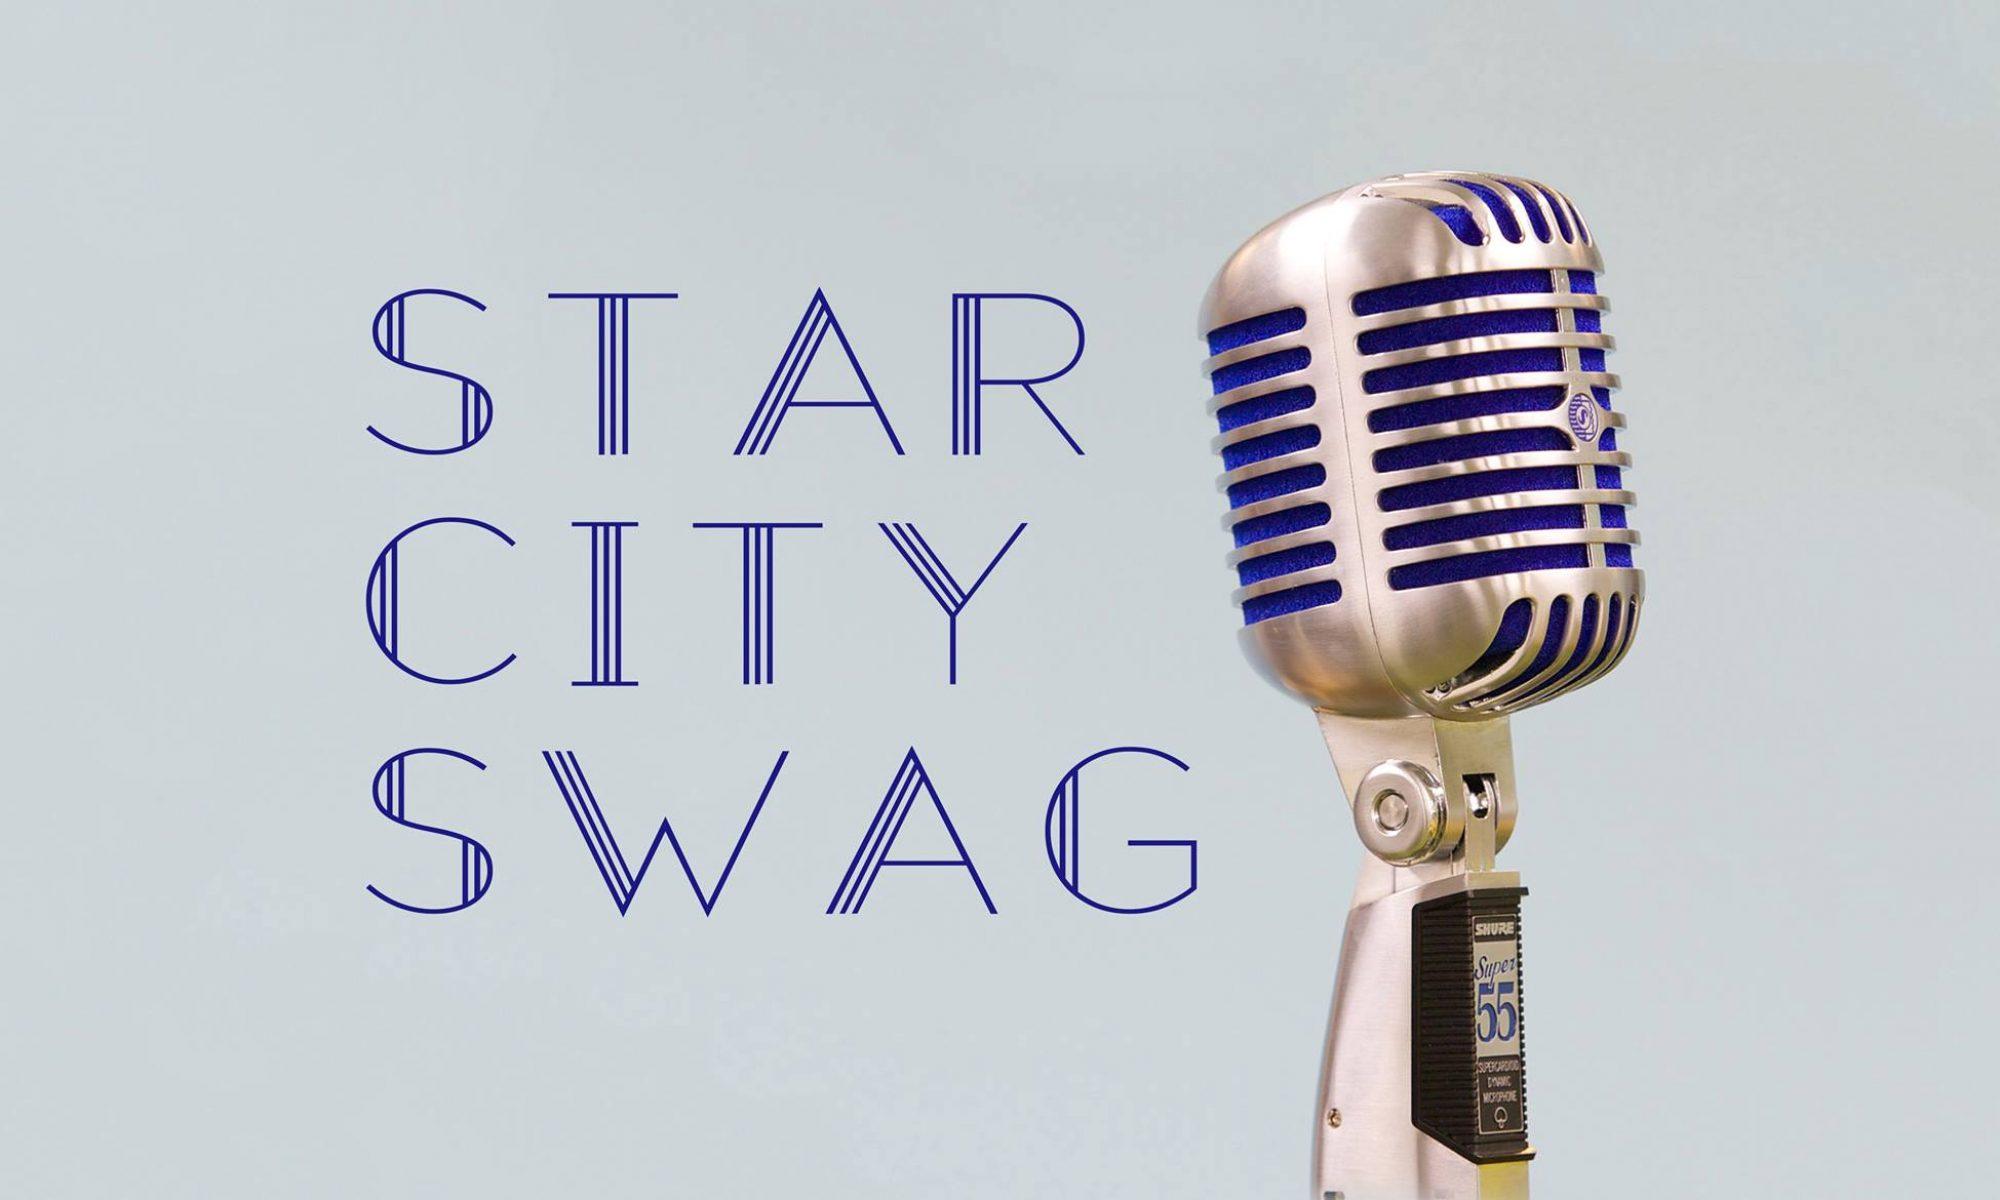 Star City Swag